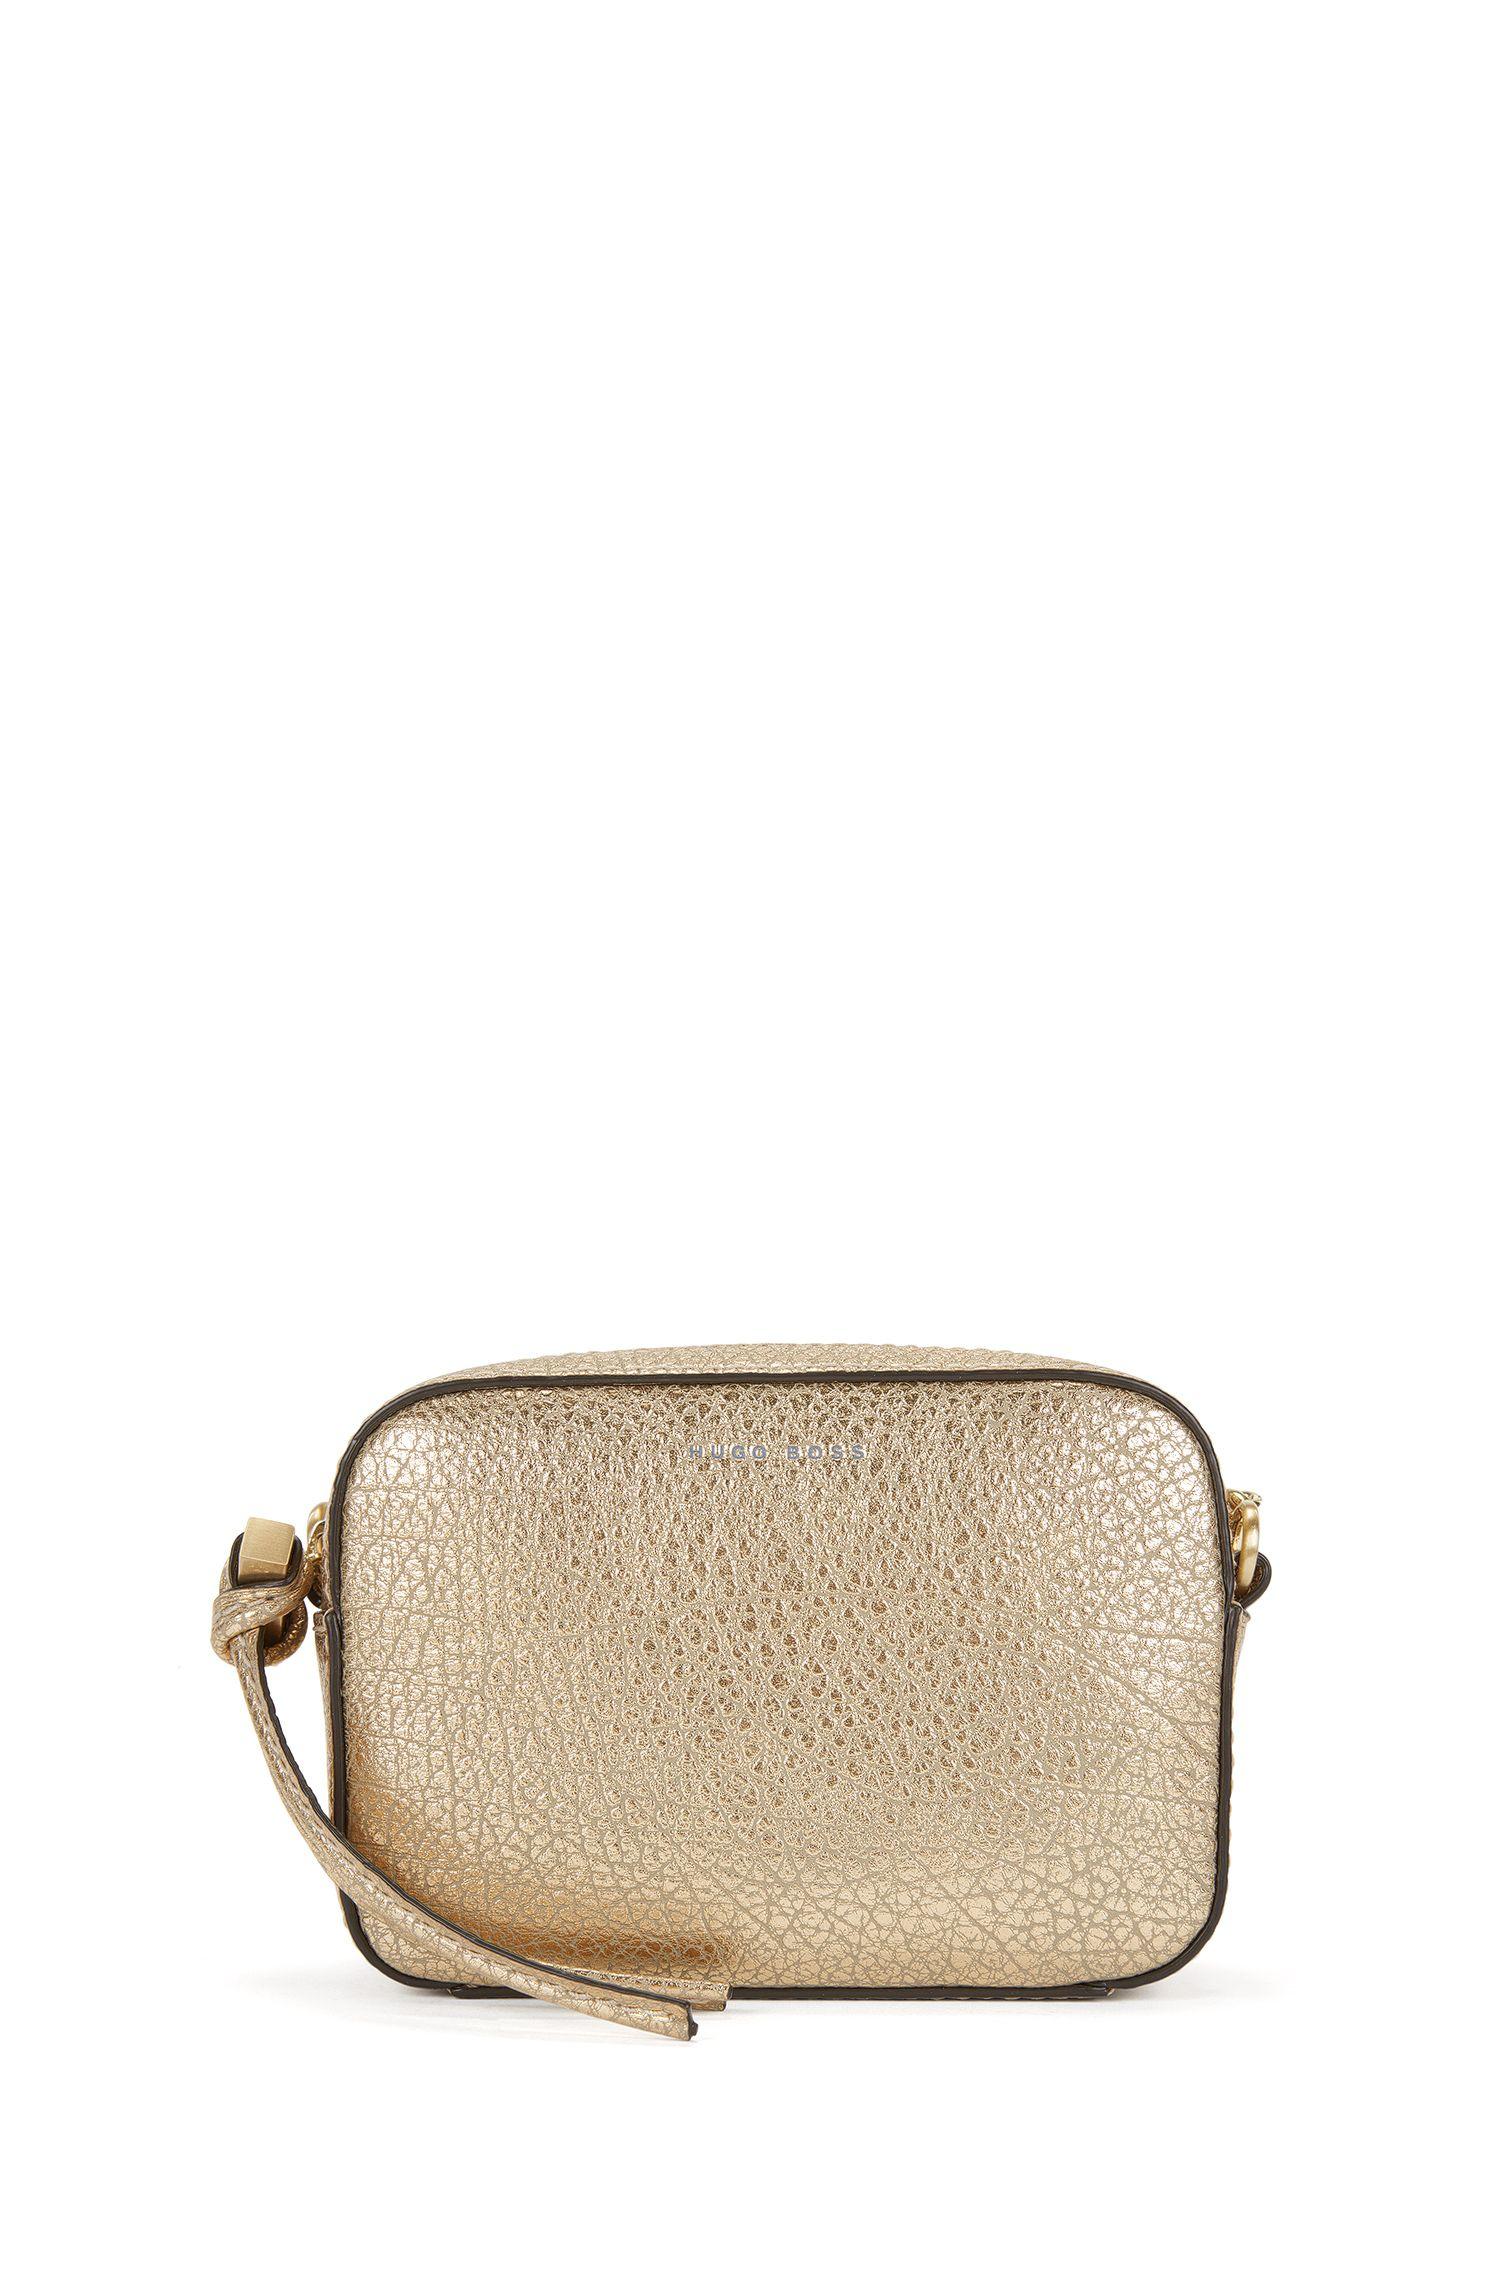 BOSS Bespoke Soft shoulder bag in metallic leather